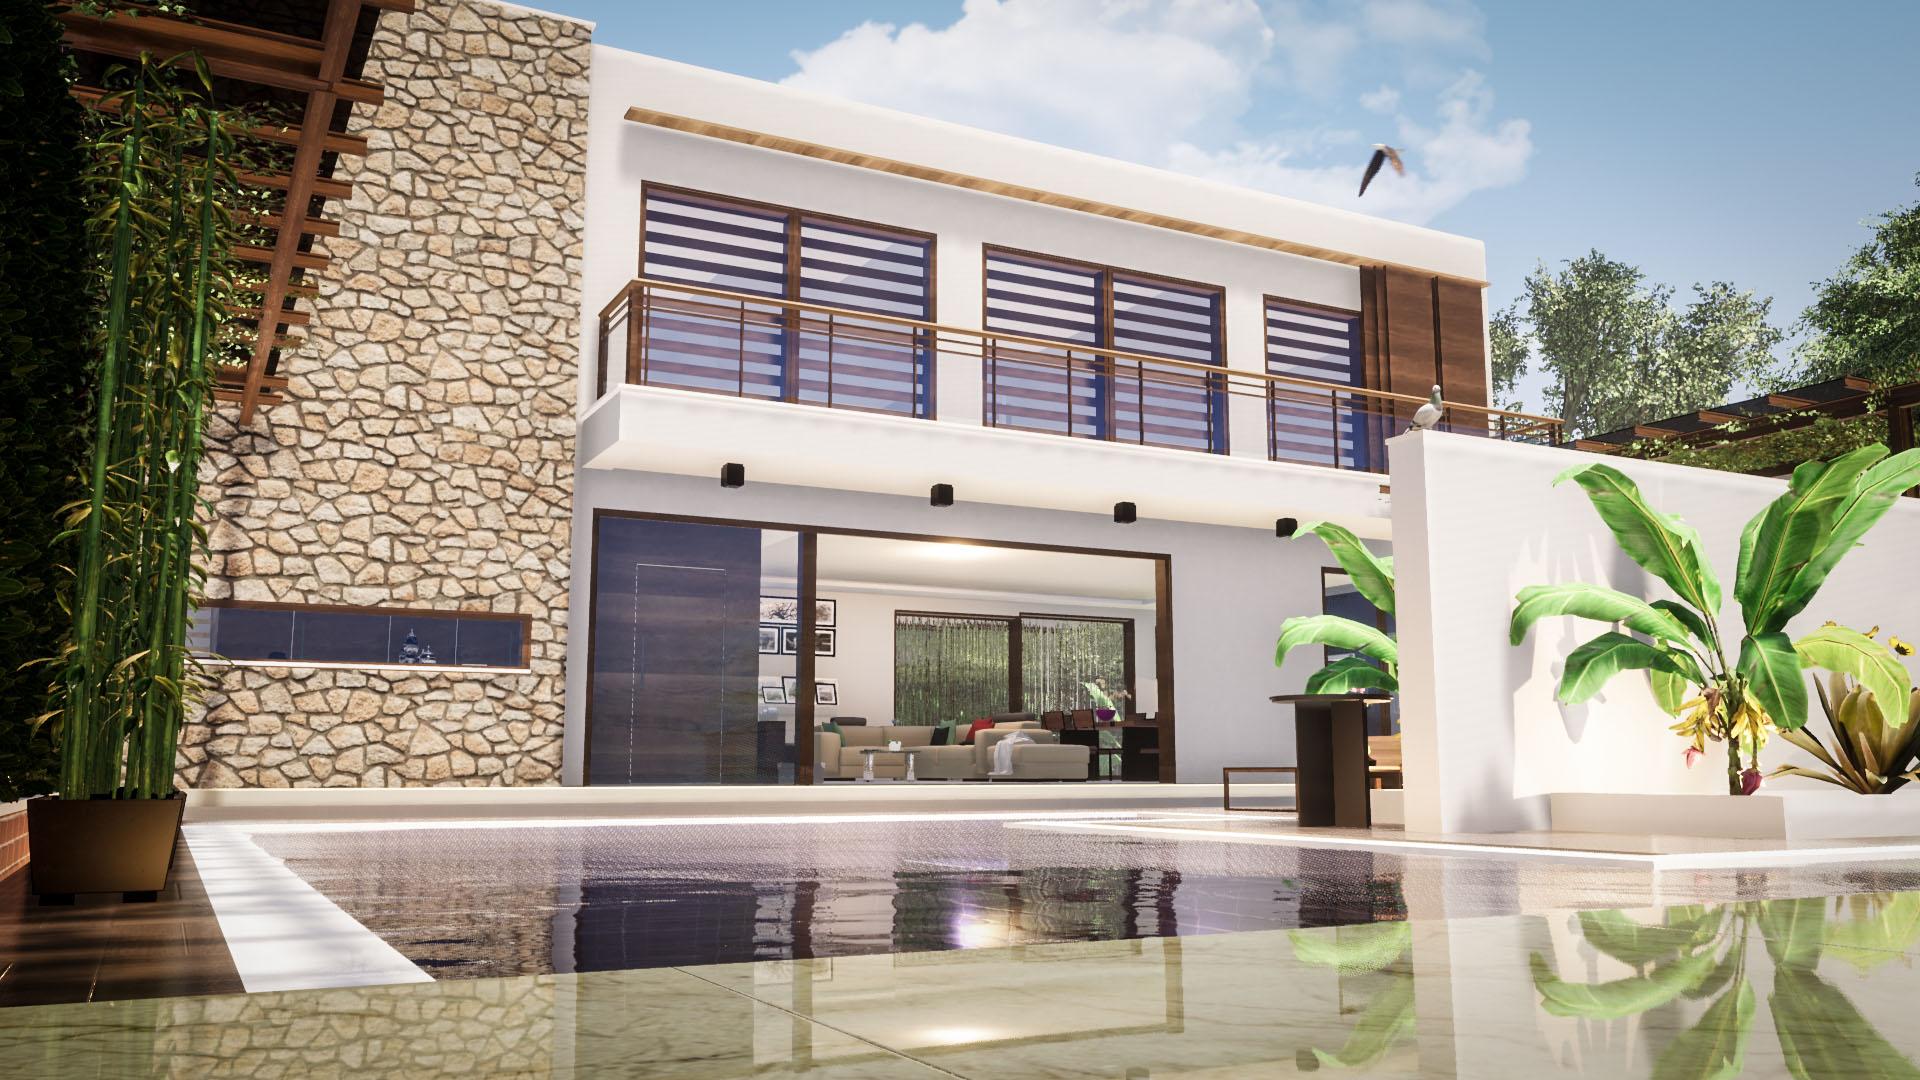 Bespoke Villa With 4 Bedrooms